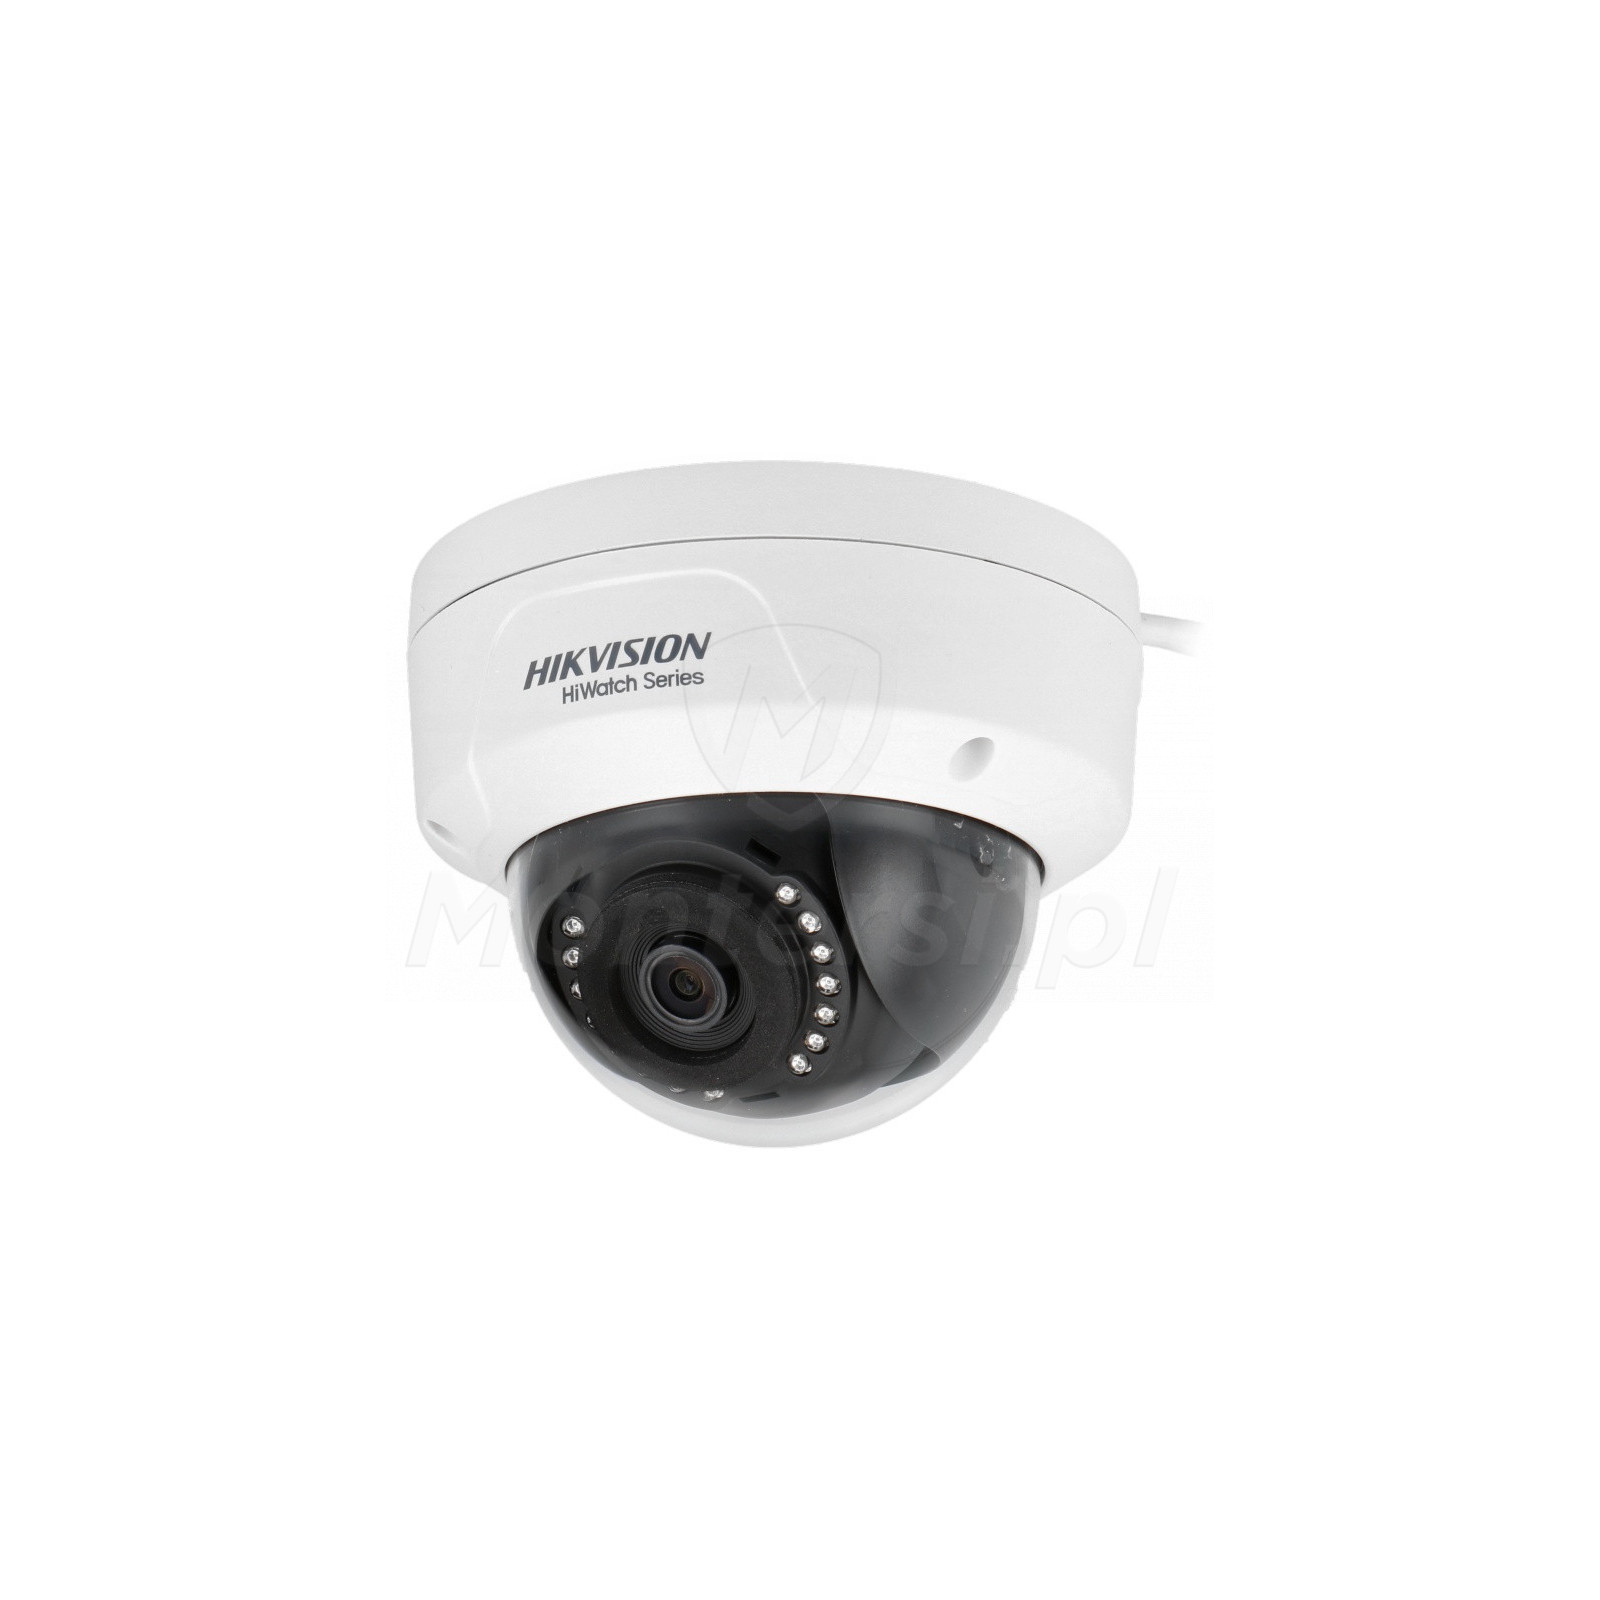 Kamera wandaloodporna HWI-D140H